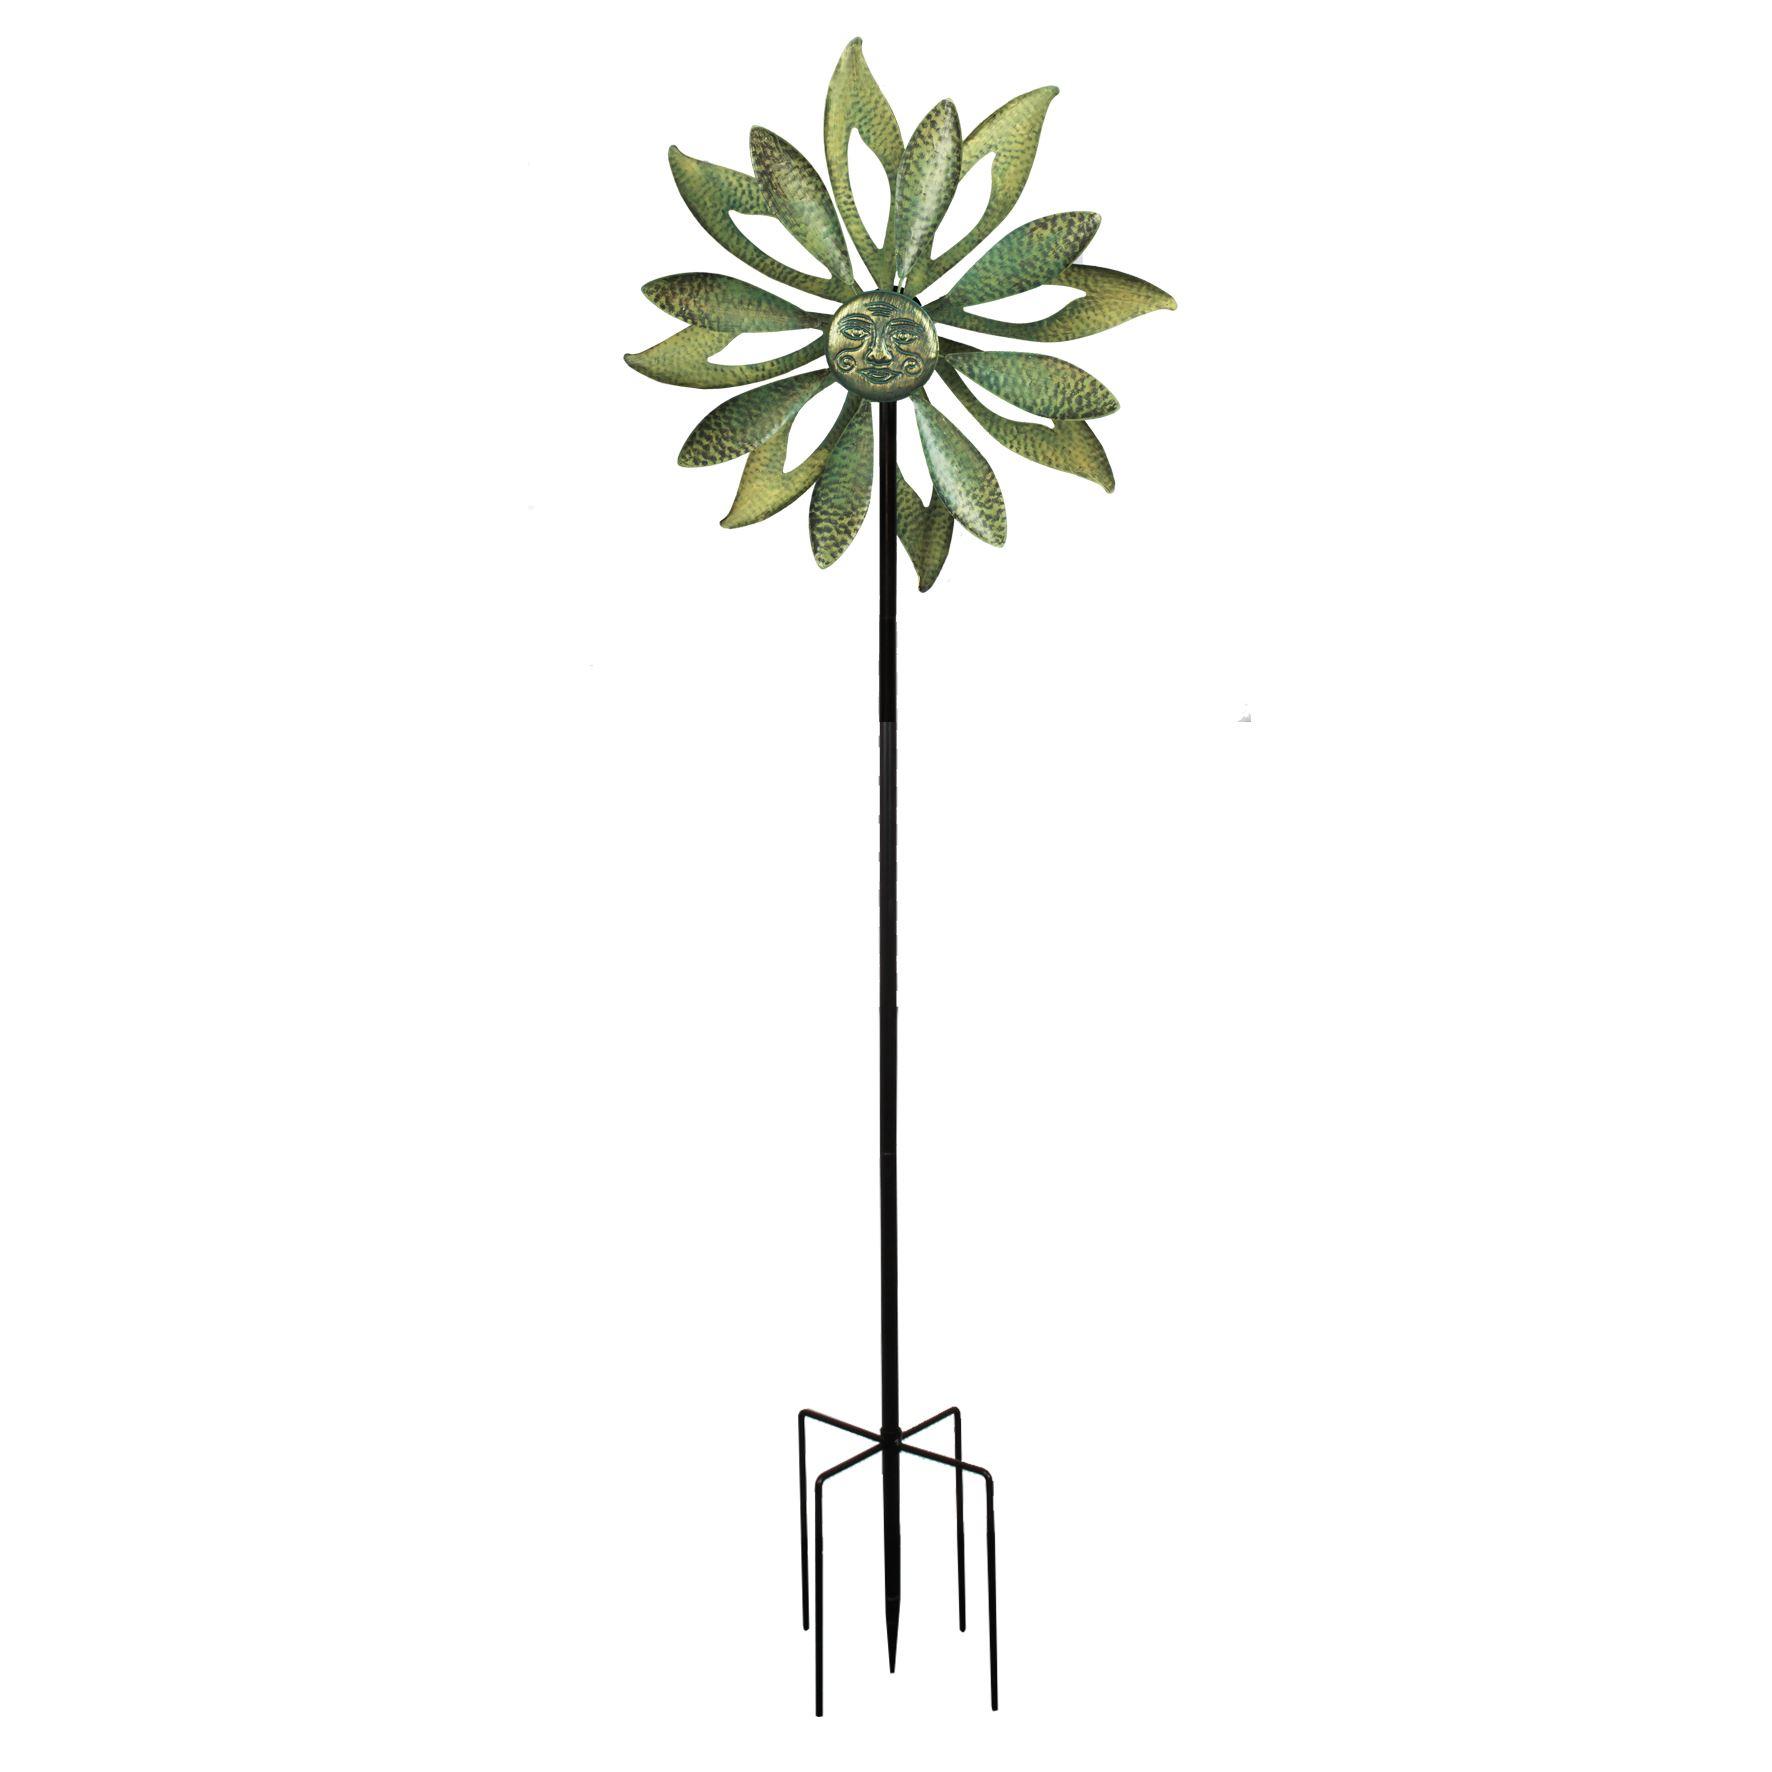 Country Living Kenetic Metal Garden Spinner Floral Sun Face - 61716